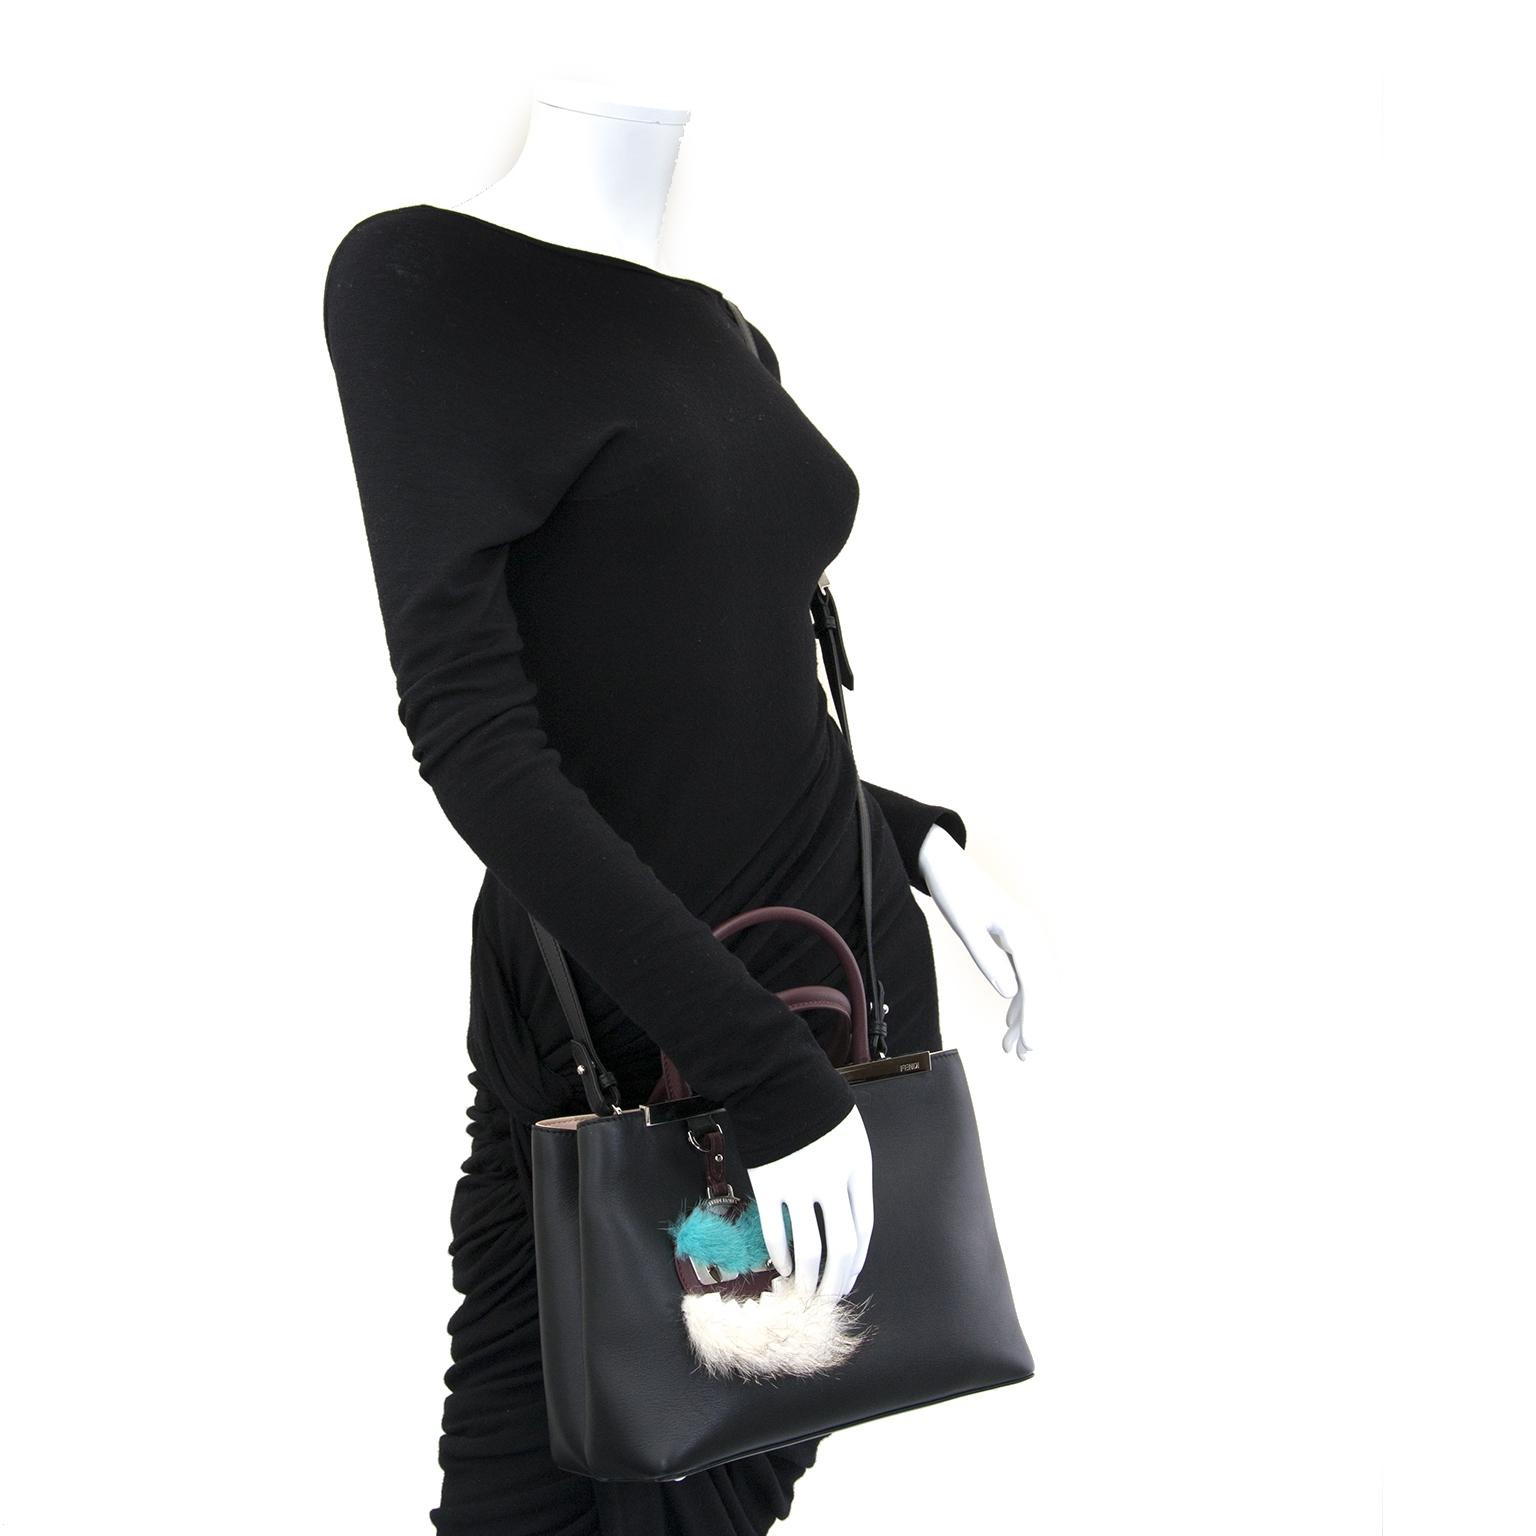 47bbffeb5f ... fendi petite 2jours black leather tote now for sale at labellov vintage  fashion webshop belgium